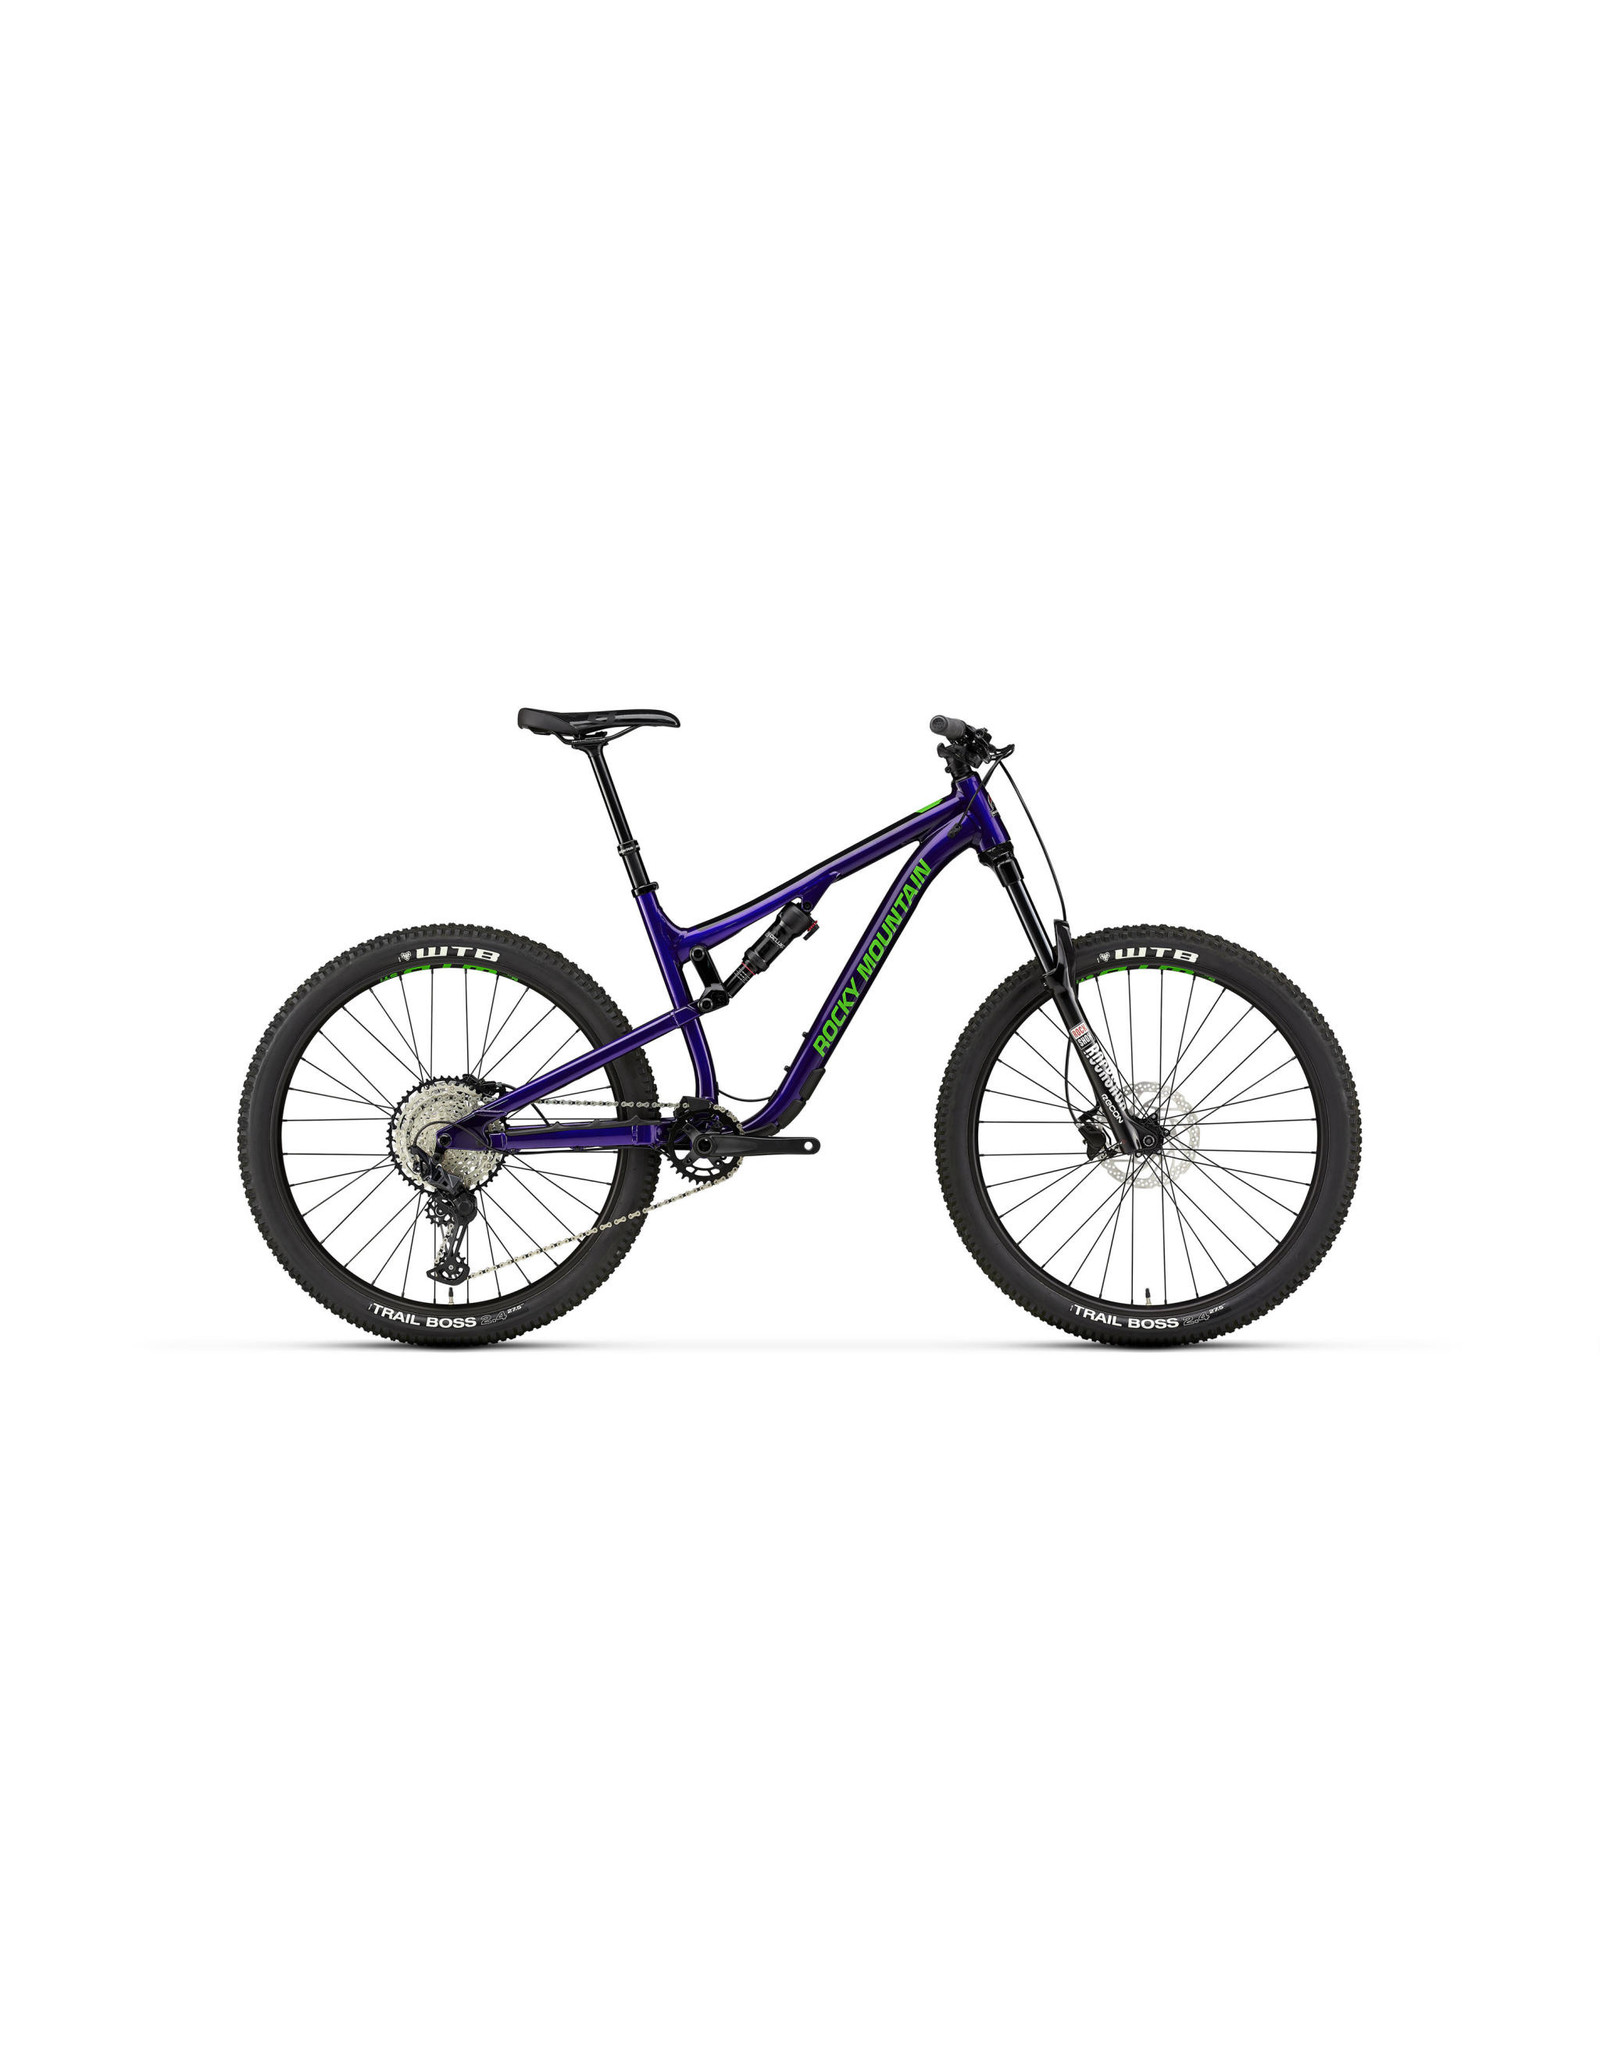 ROCKY MOUNTAIN 2021 Rocky Mountain Thunderbolt Alloy 10 - Purple/Black - X-Small